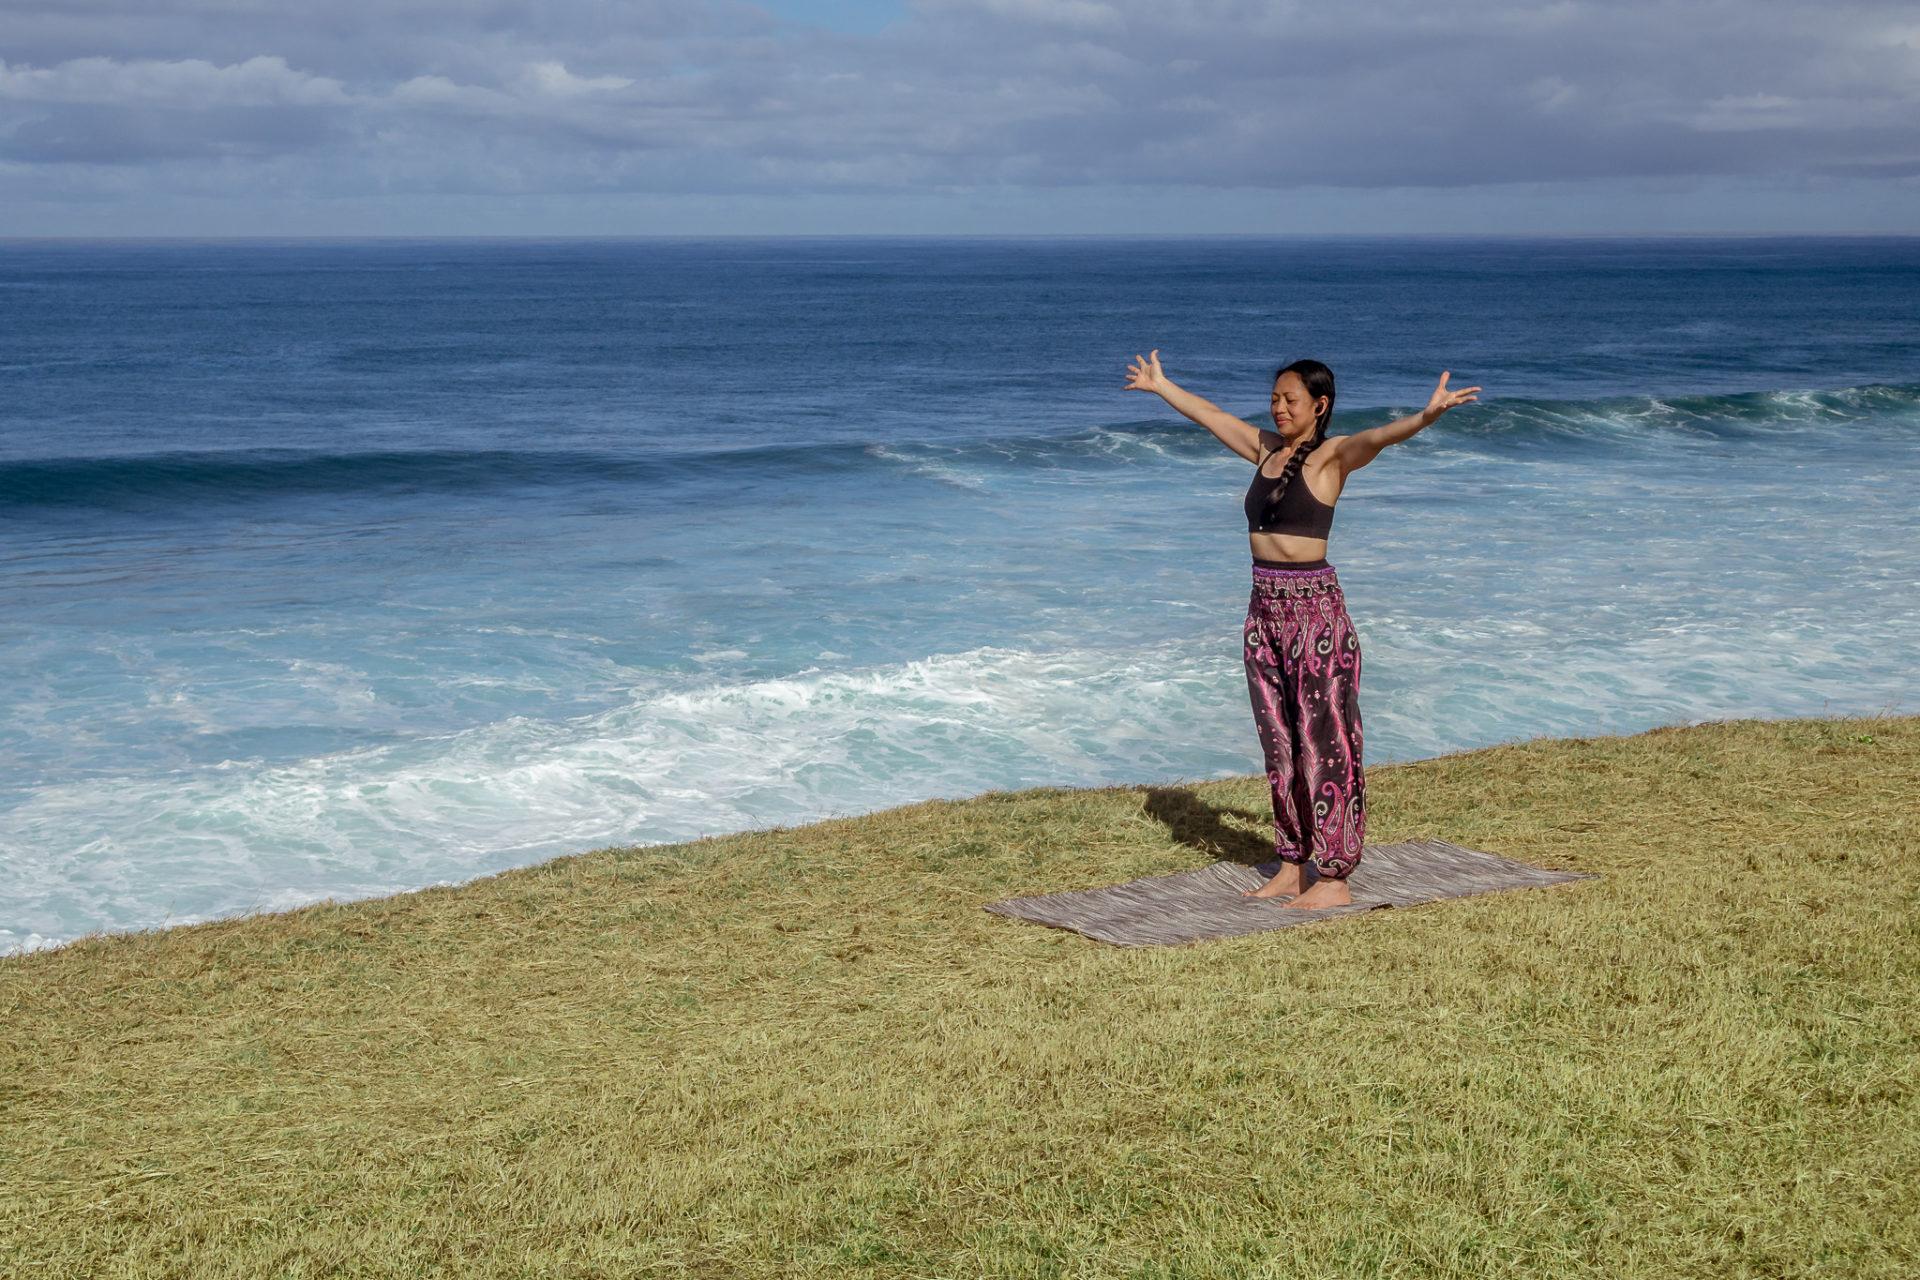 femme bras ouverts accueillir bord de mer ciel bleu